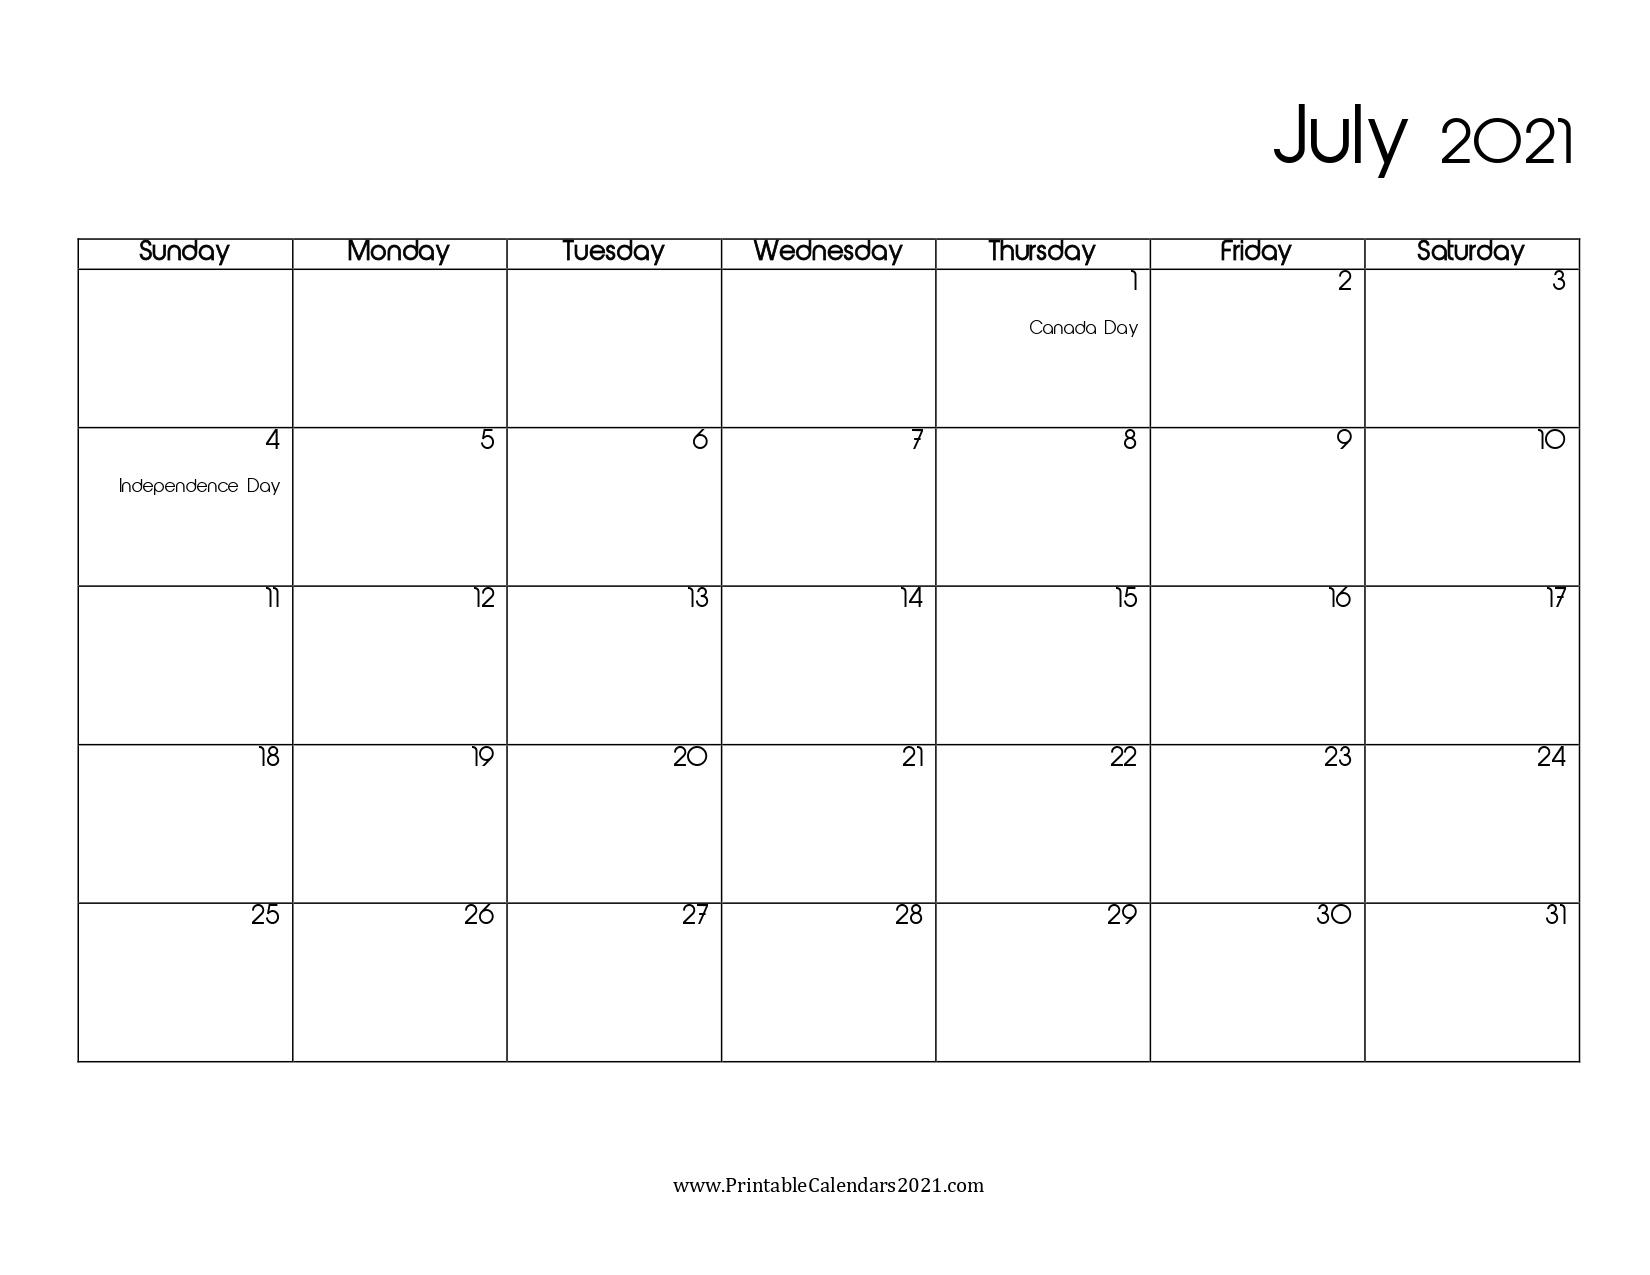 45+ July 2021 Calendar Printable, July 2021 Calendar Pdf, Blank, Free July 2021 Calendar Pdf Download